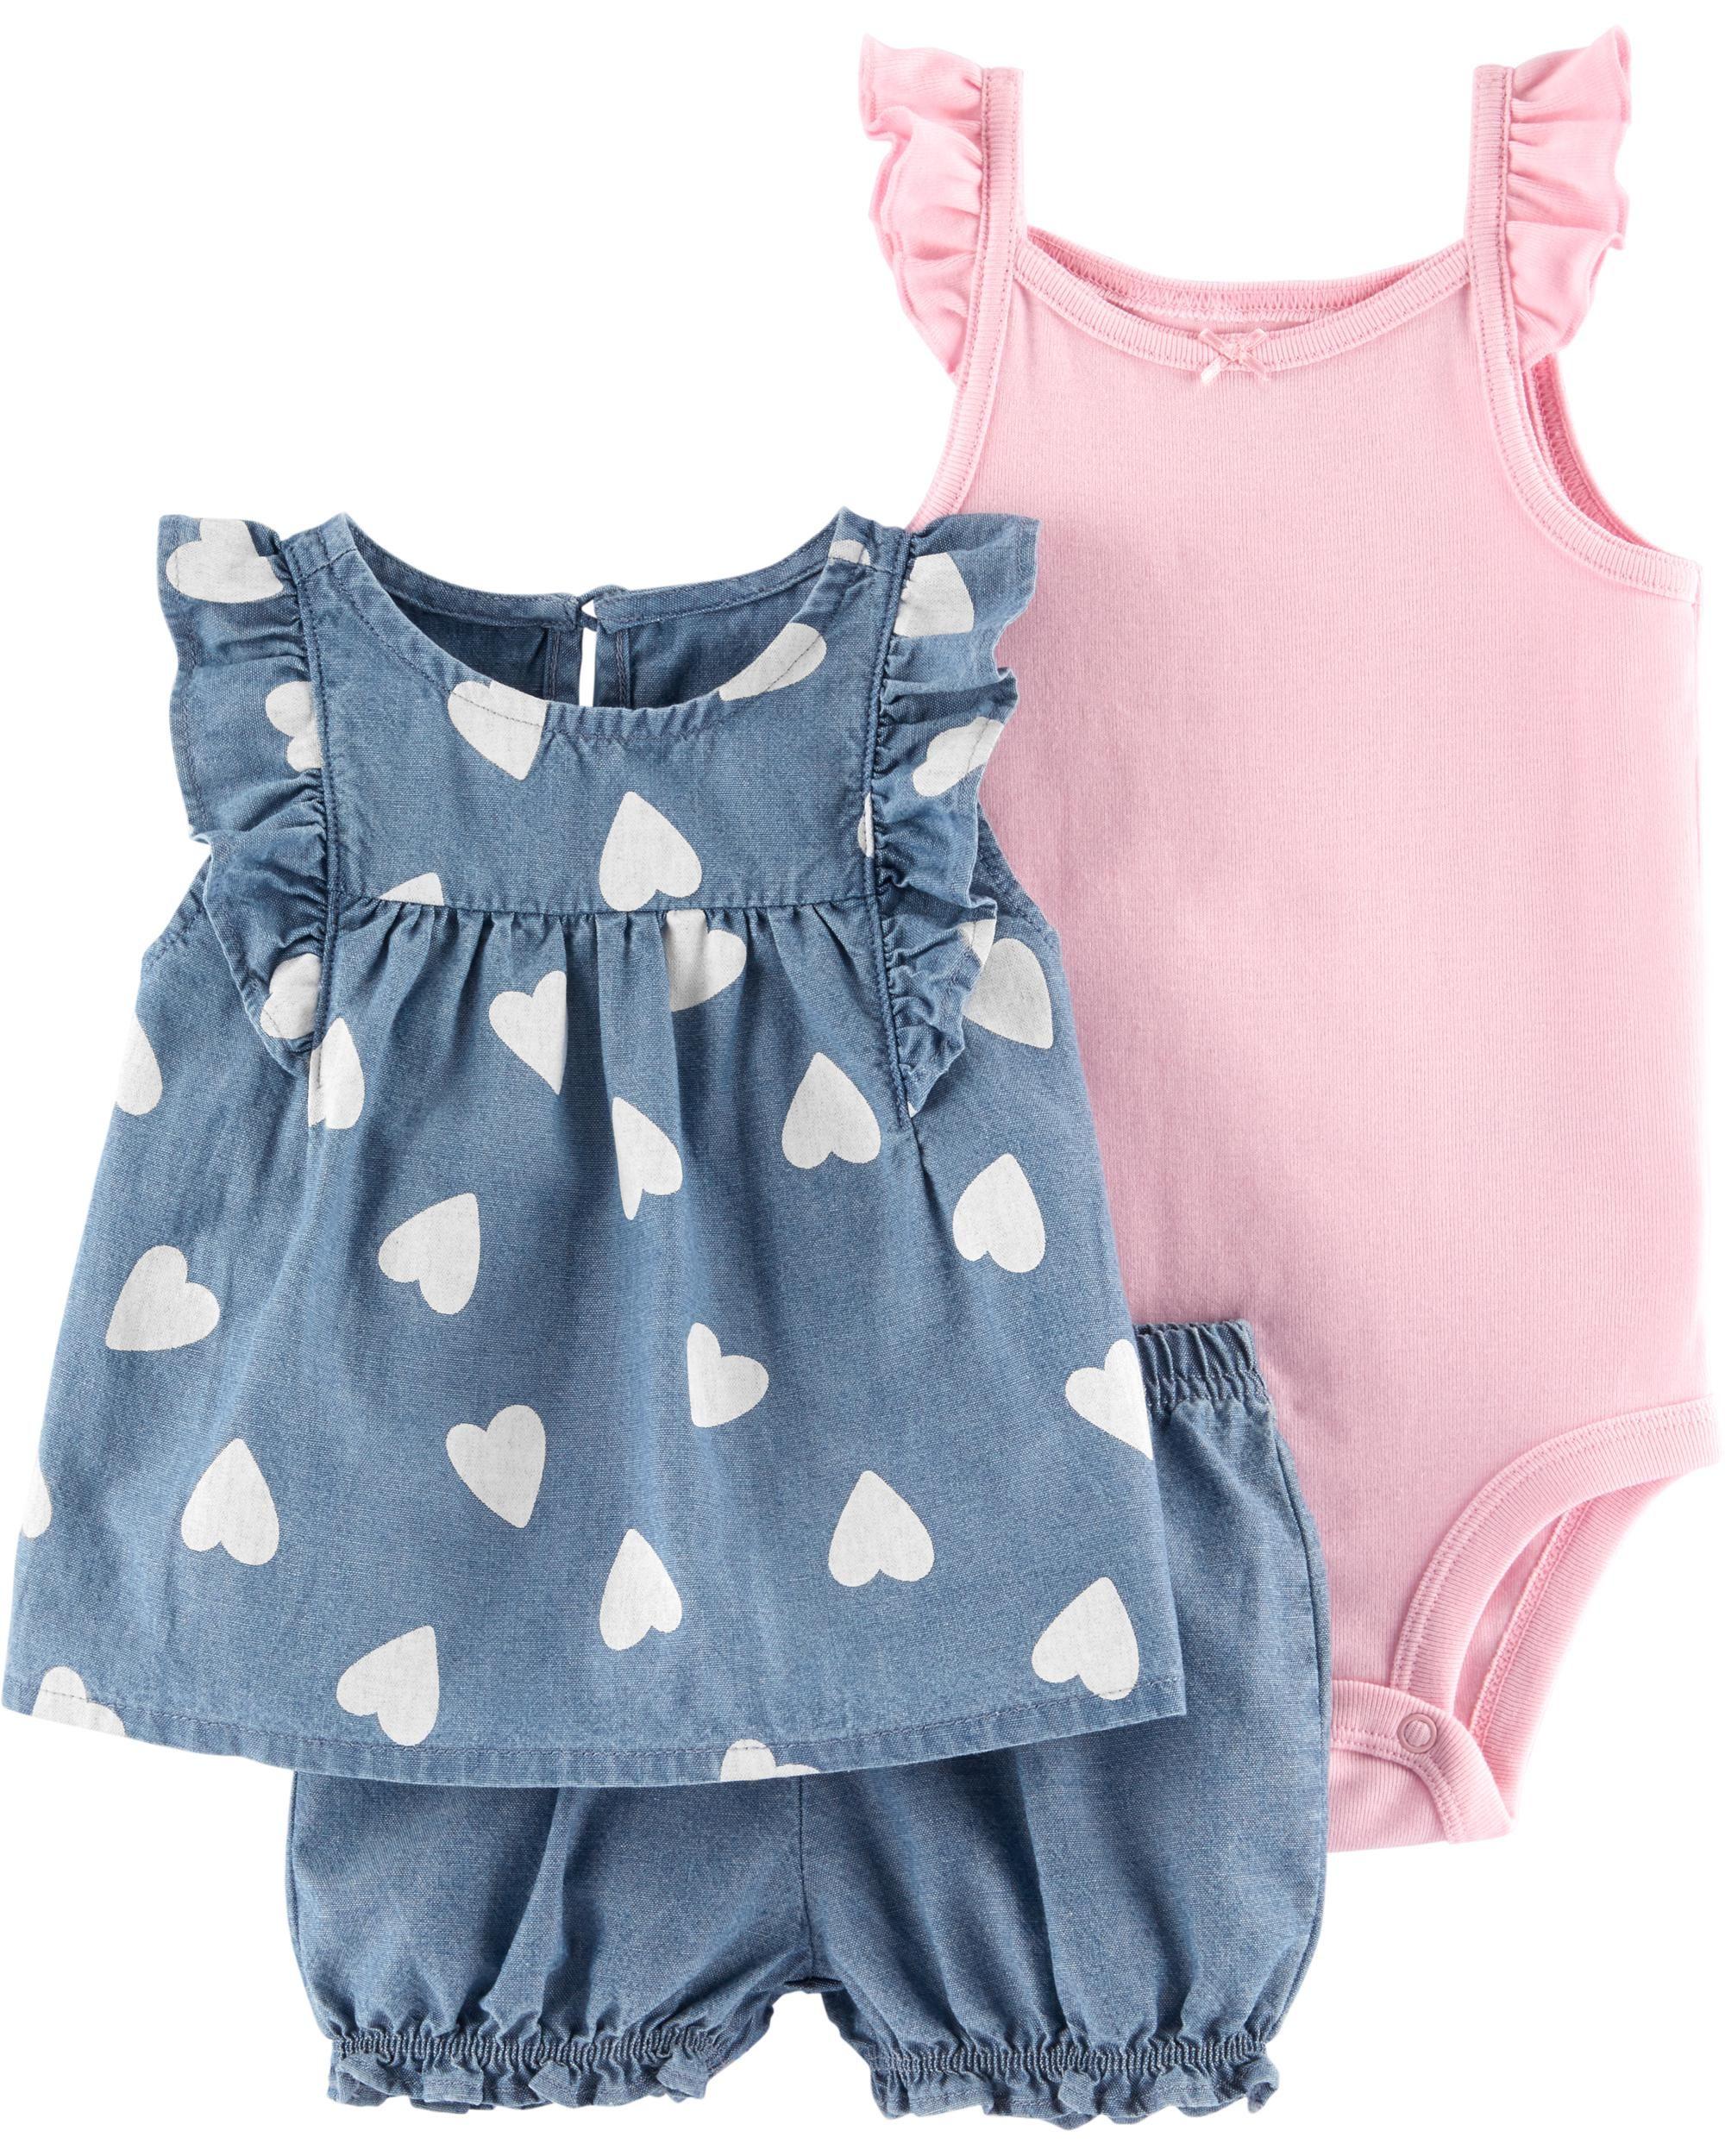 baby girl tank and shorts baby girl summer 0-3month baby girl Newborn girl summer outfit pink summer baby outfit pink and white stripes